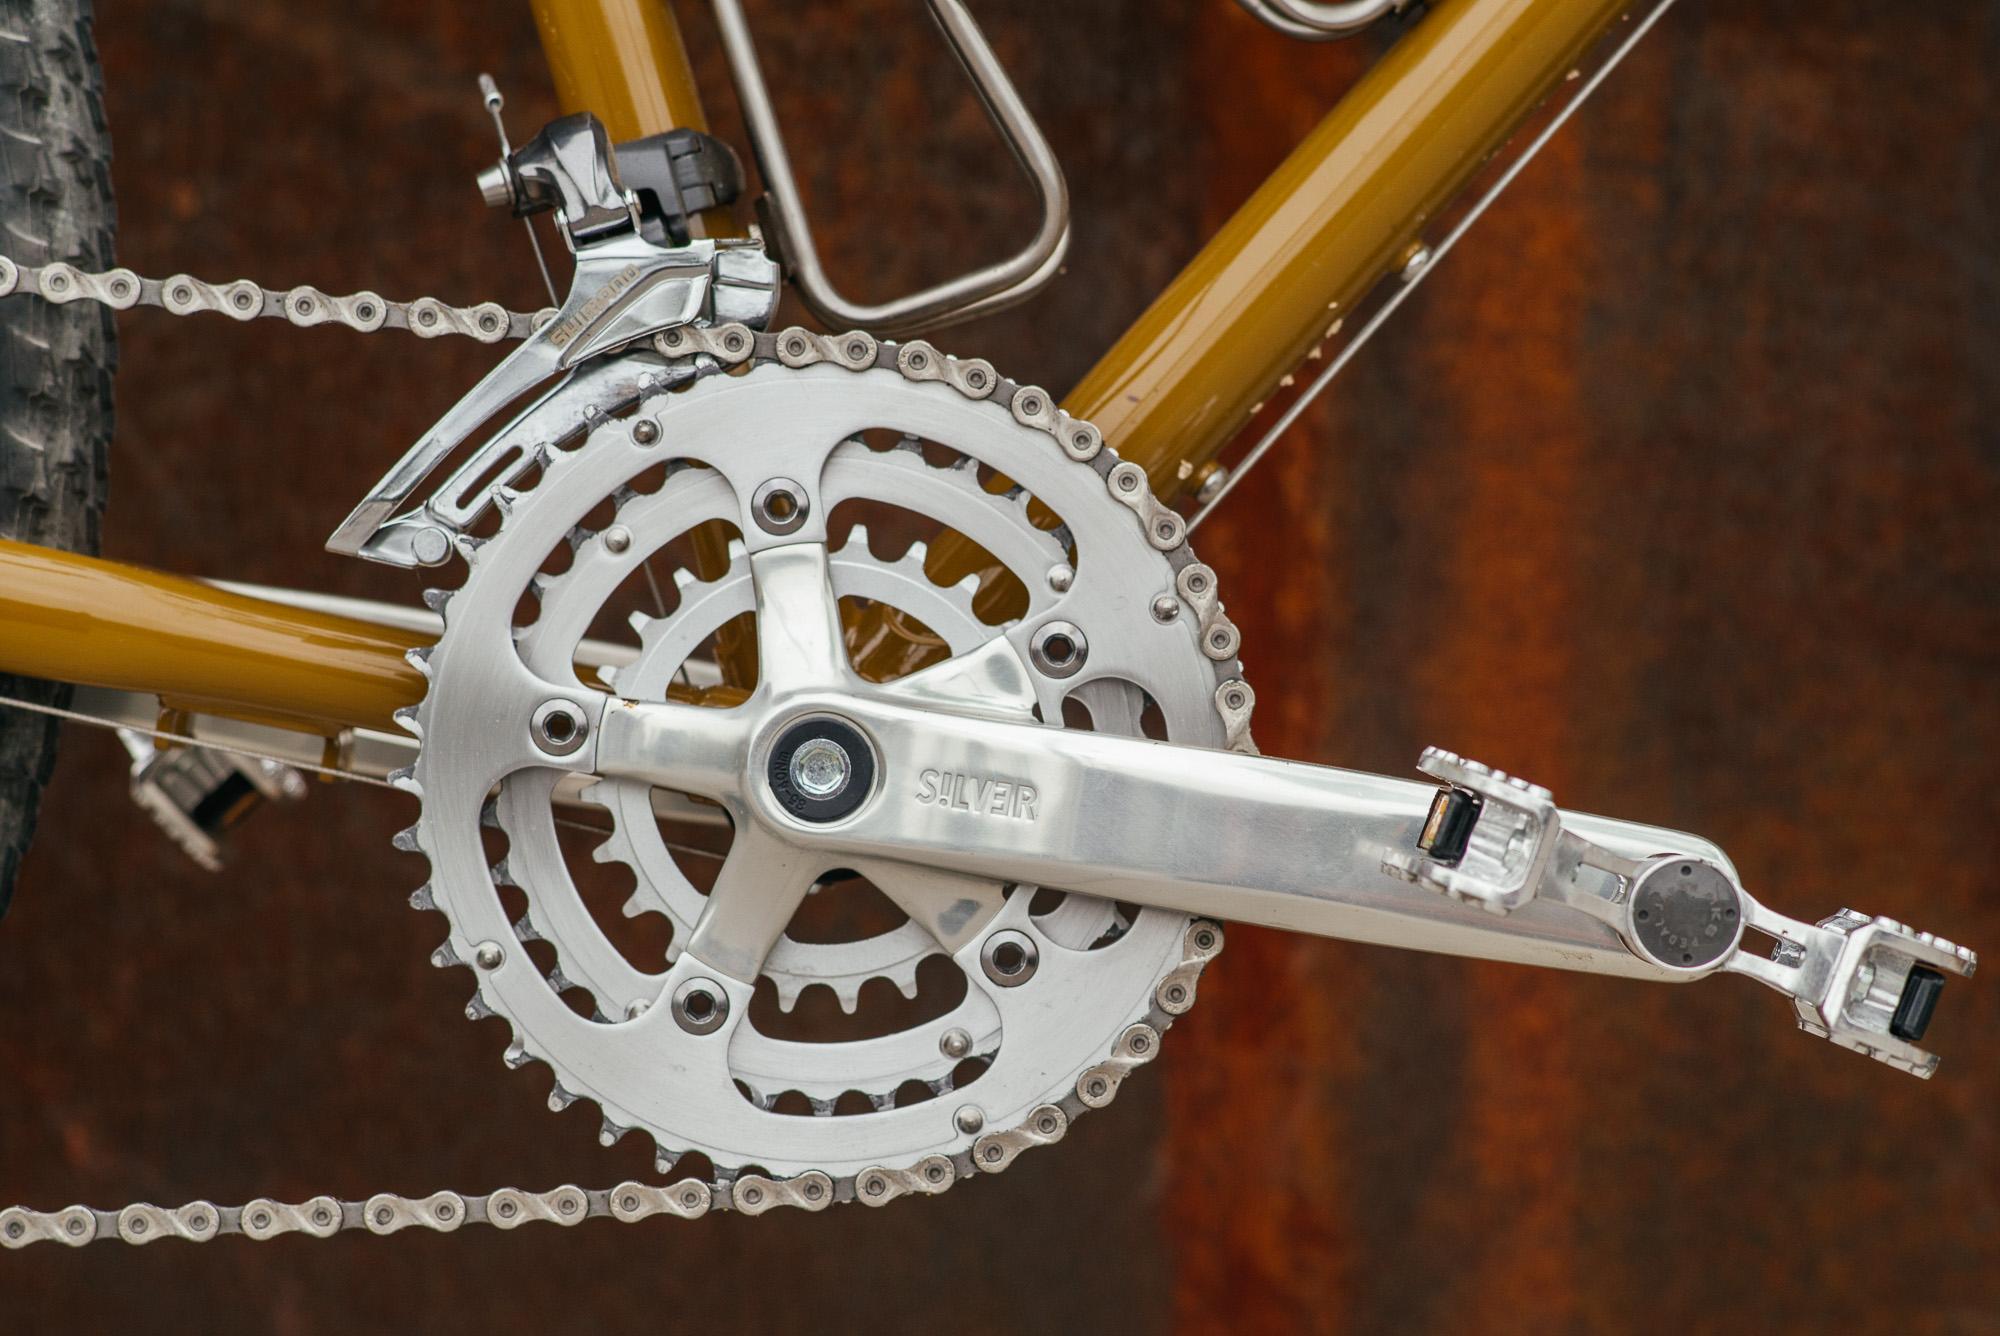 Jonathan's Rivendell Joe Appaloosa Touring Bike